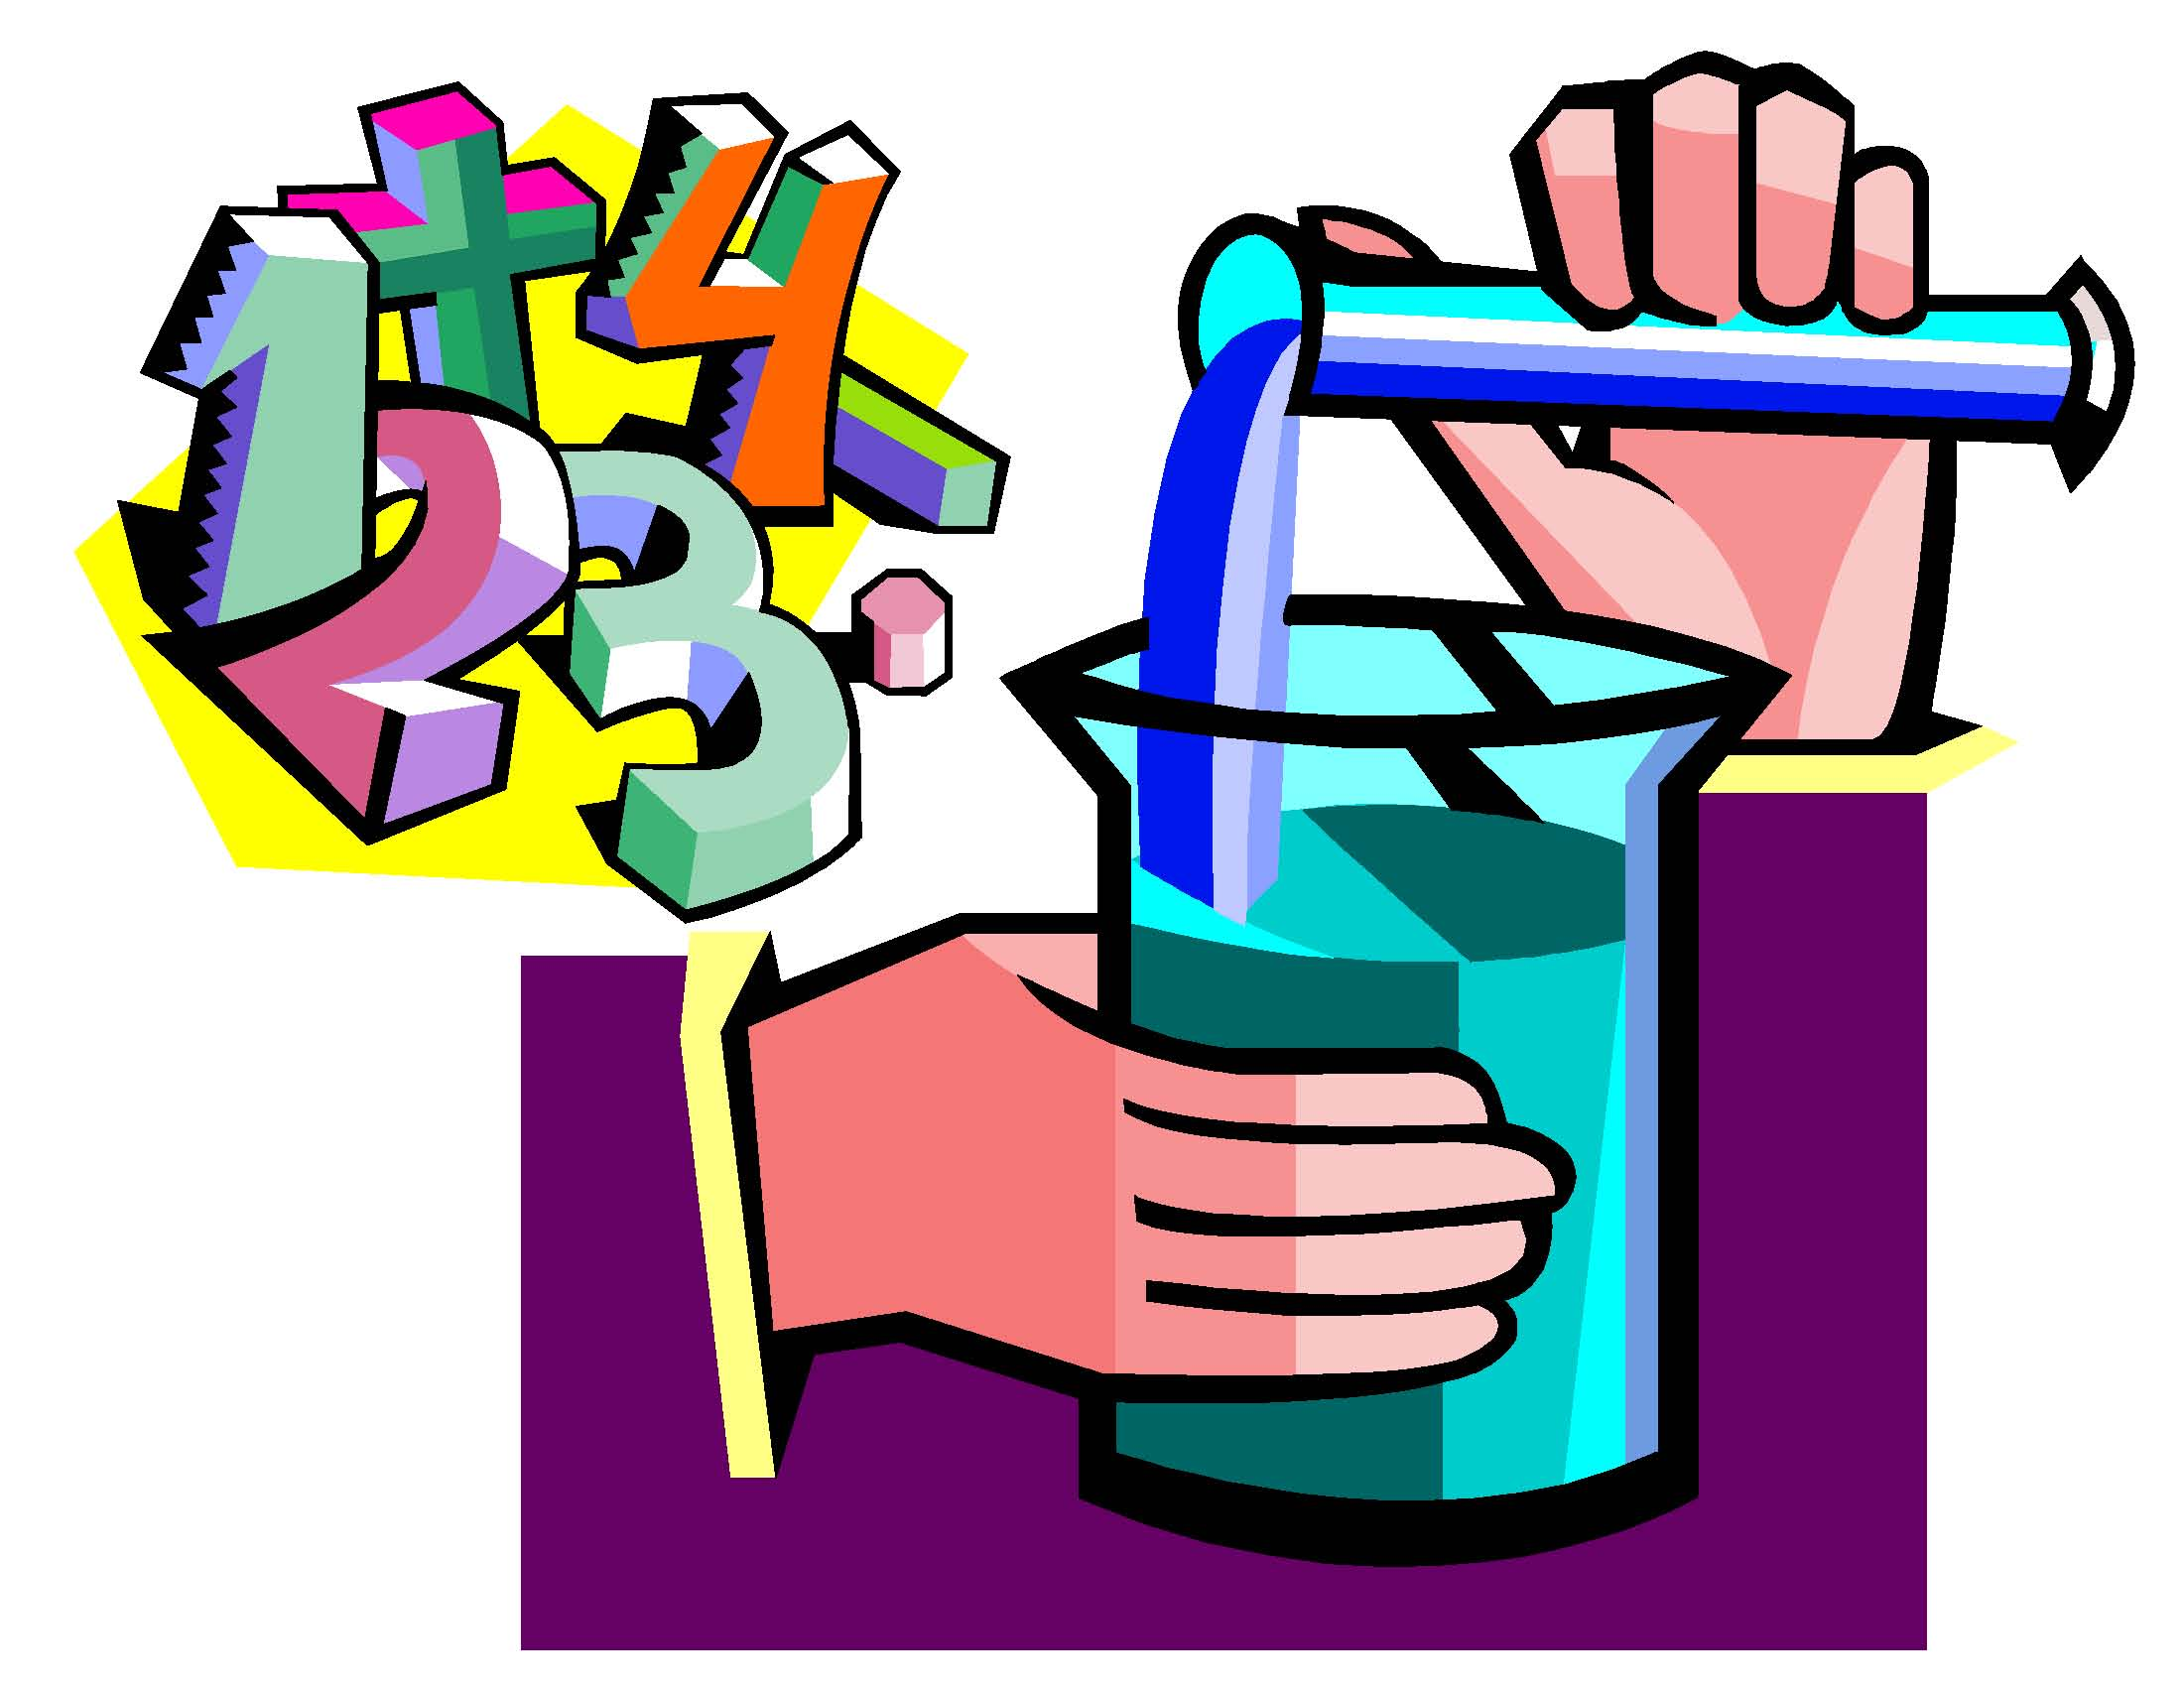 2201x1701 Math clip art kids clipart image 1 2